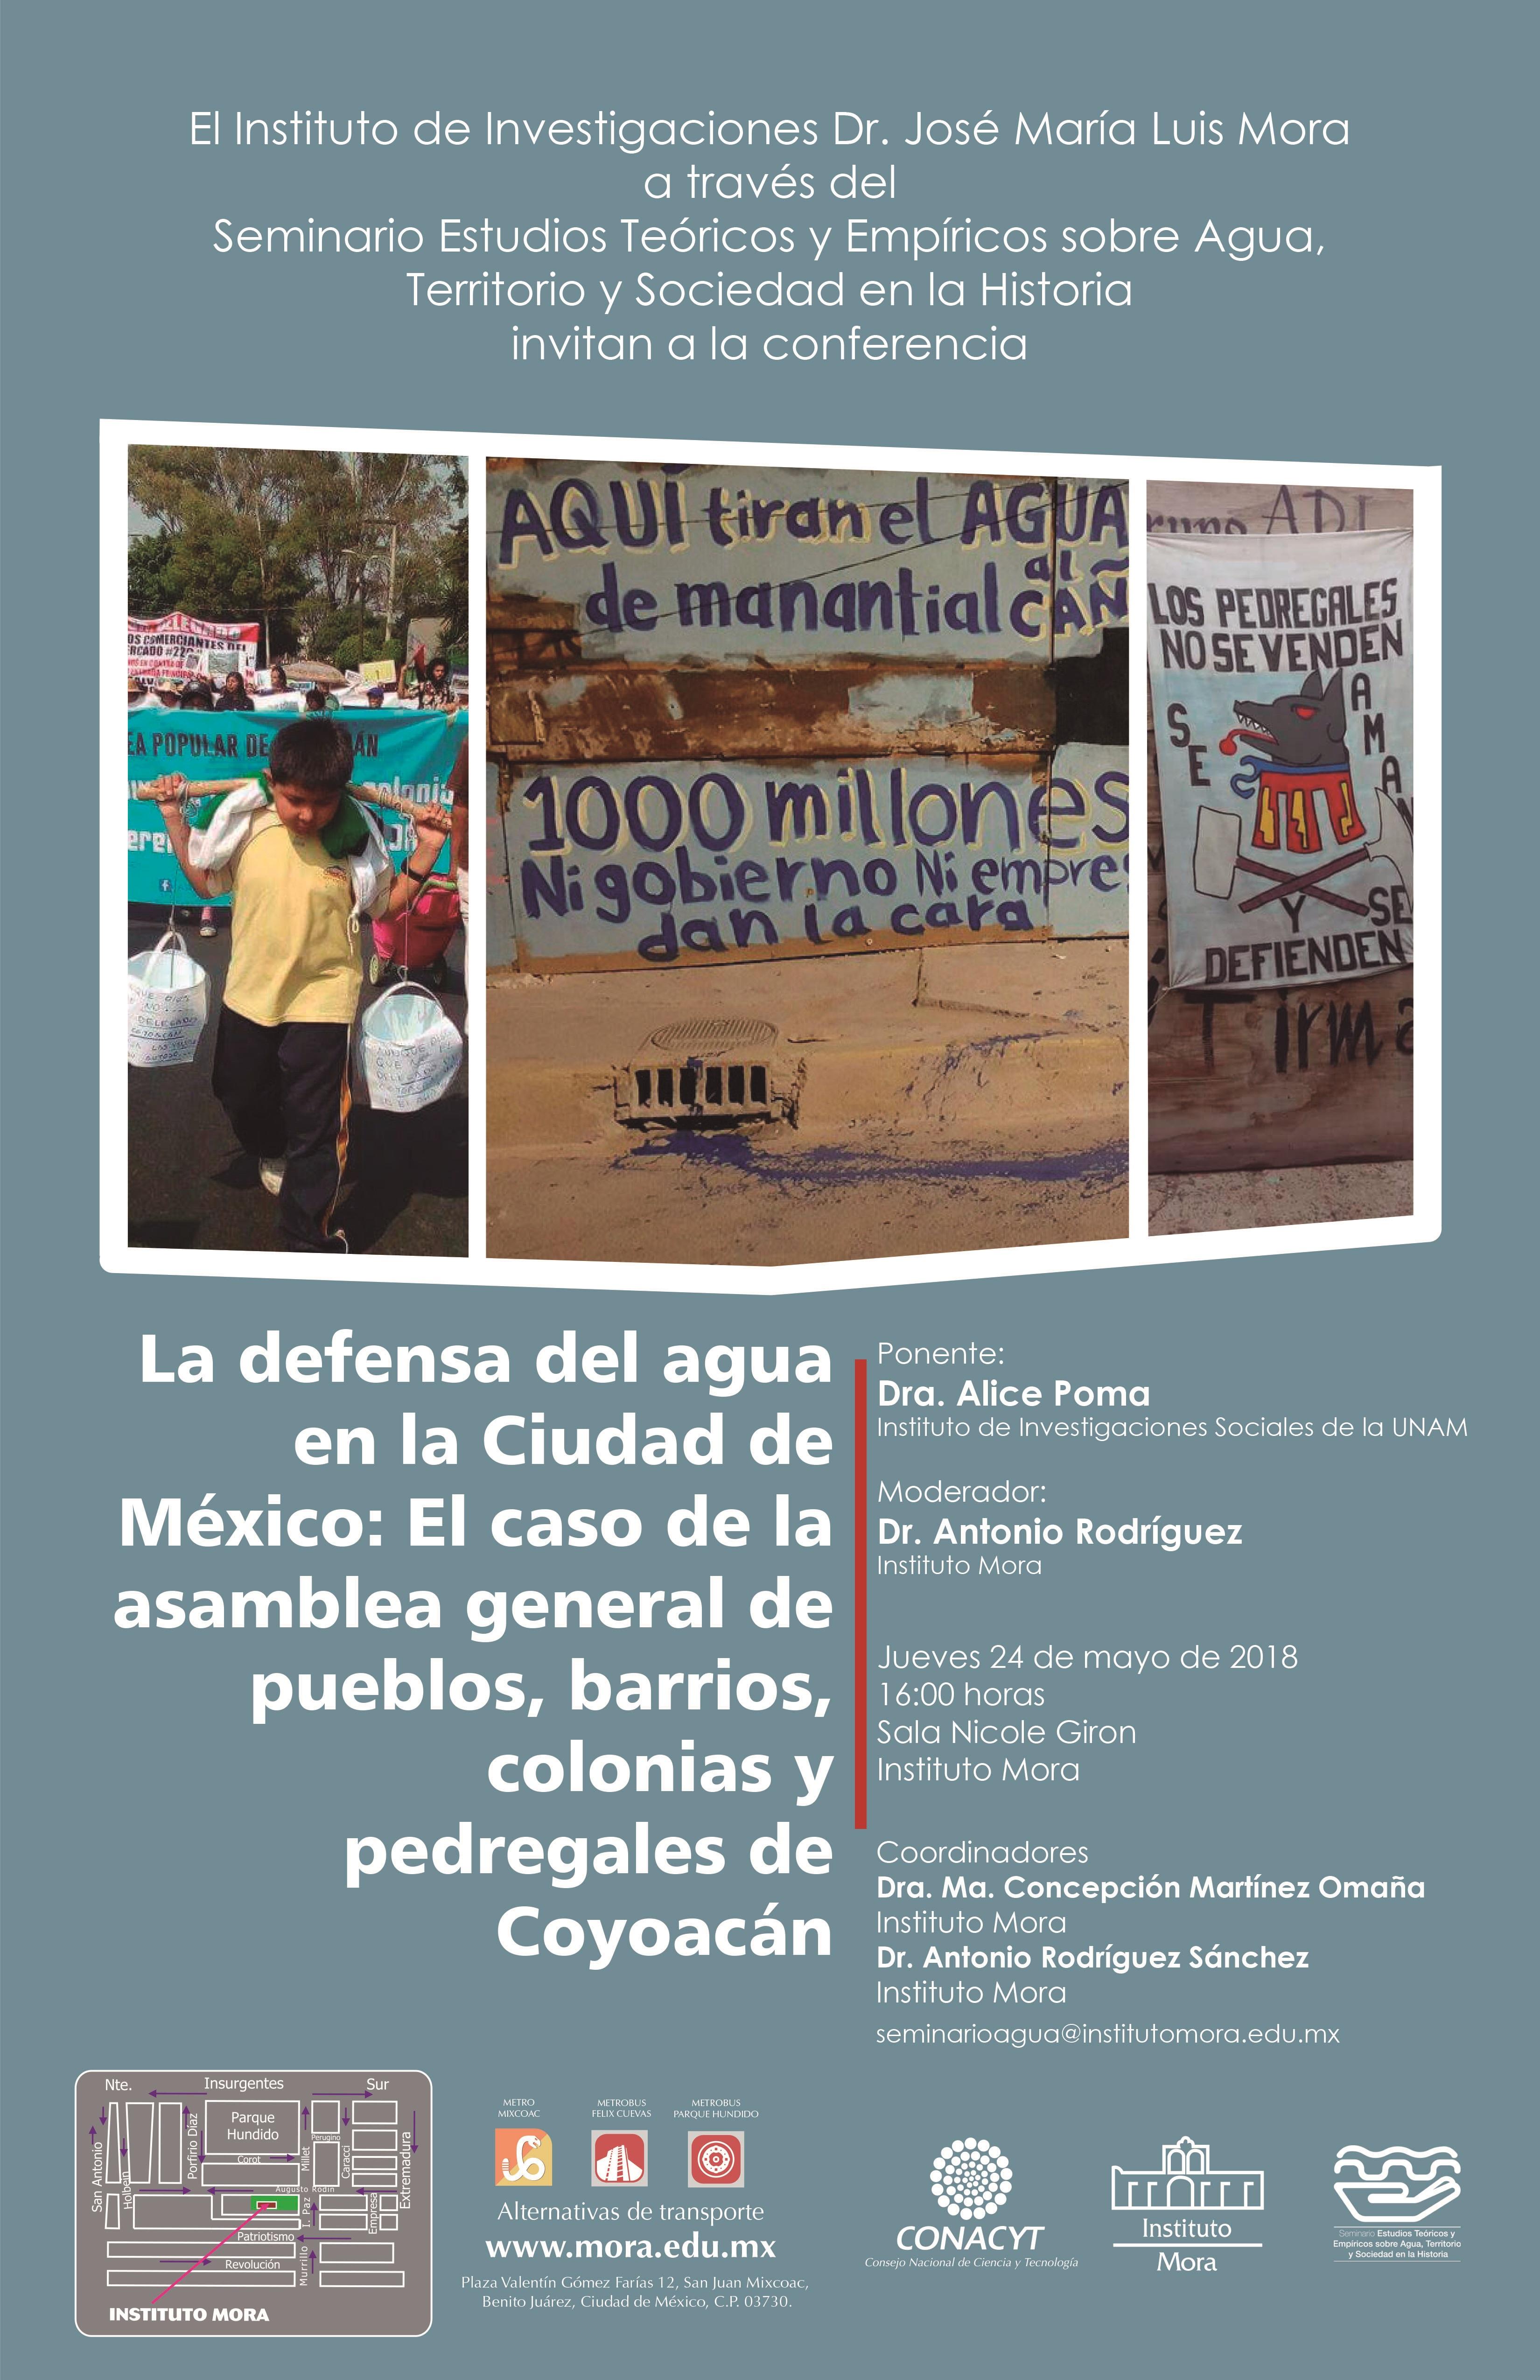 http://www.mora.edu.mx/Instituto/IE/1018_IESem14-0518.jpg